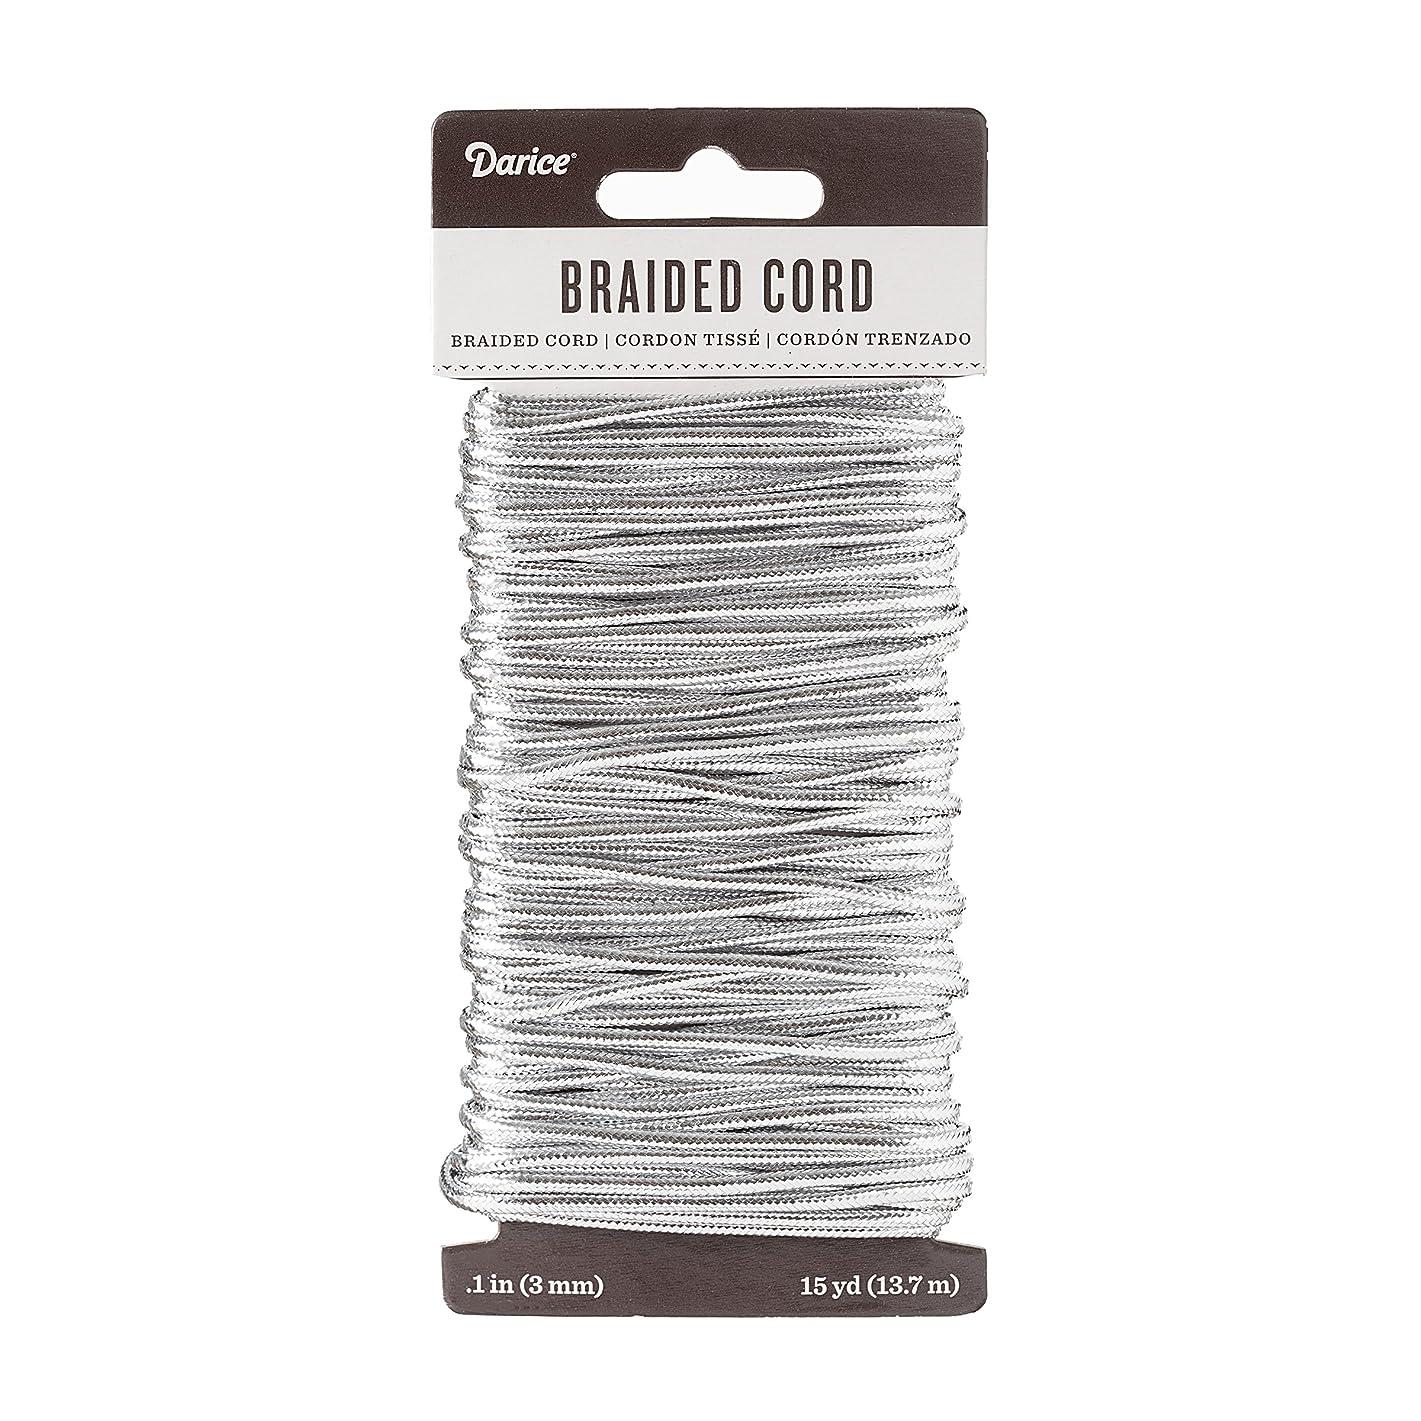 Darice Silver Braided Cording